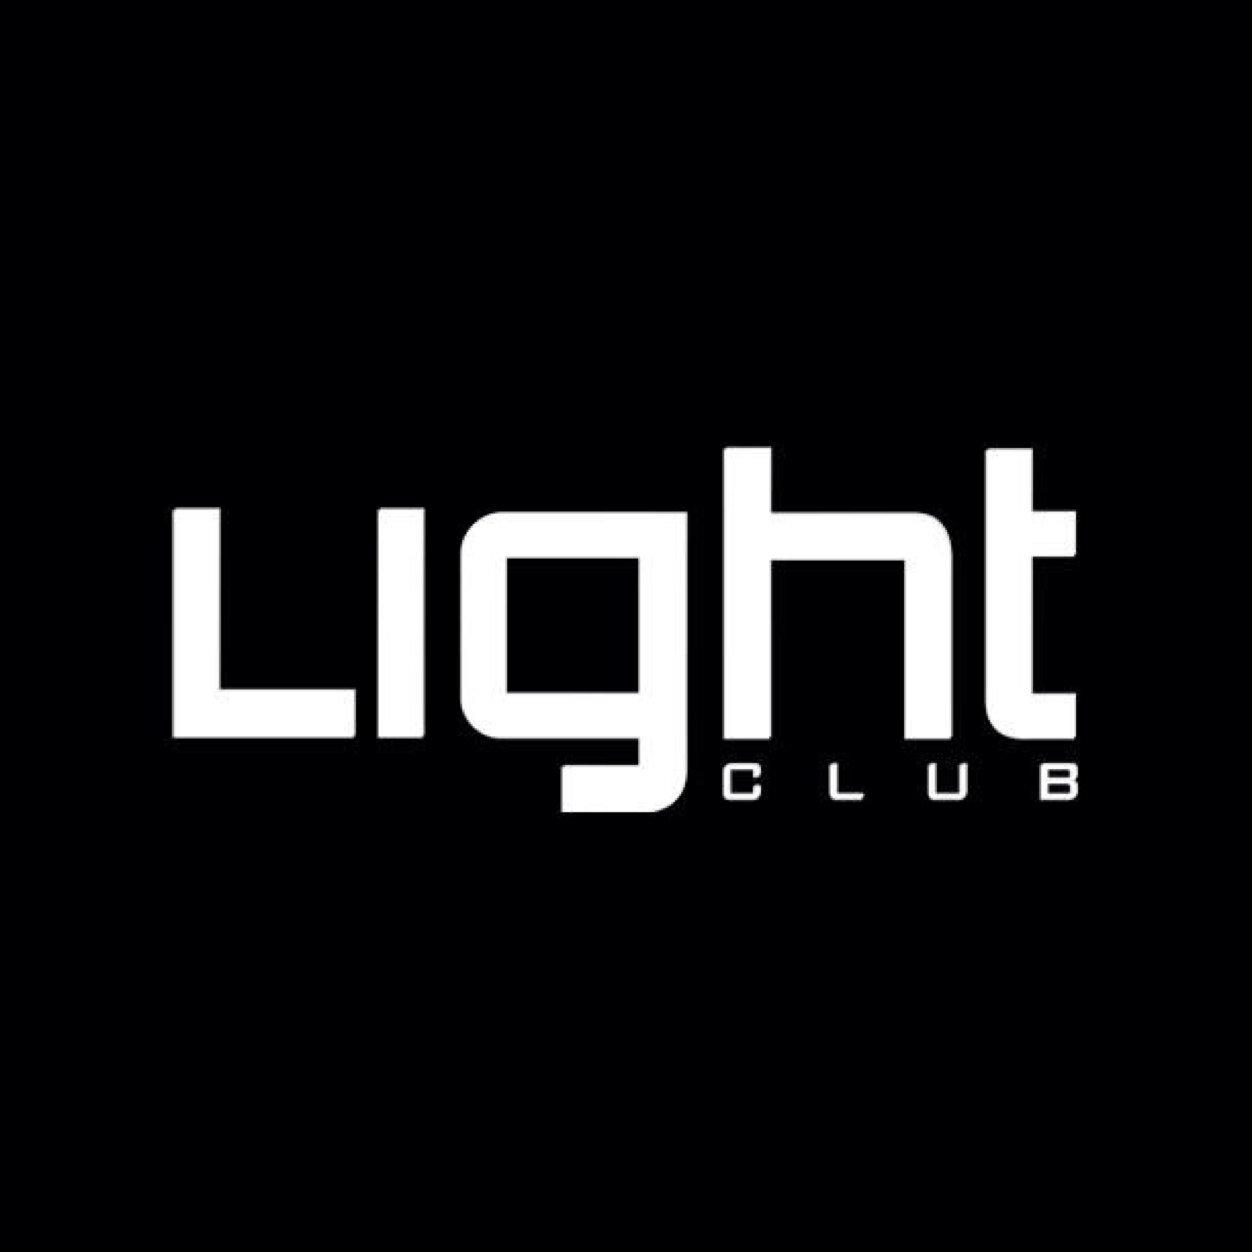 Light club hmo lightclubhmo twitter - Licht nightclub ...